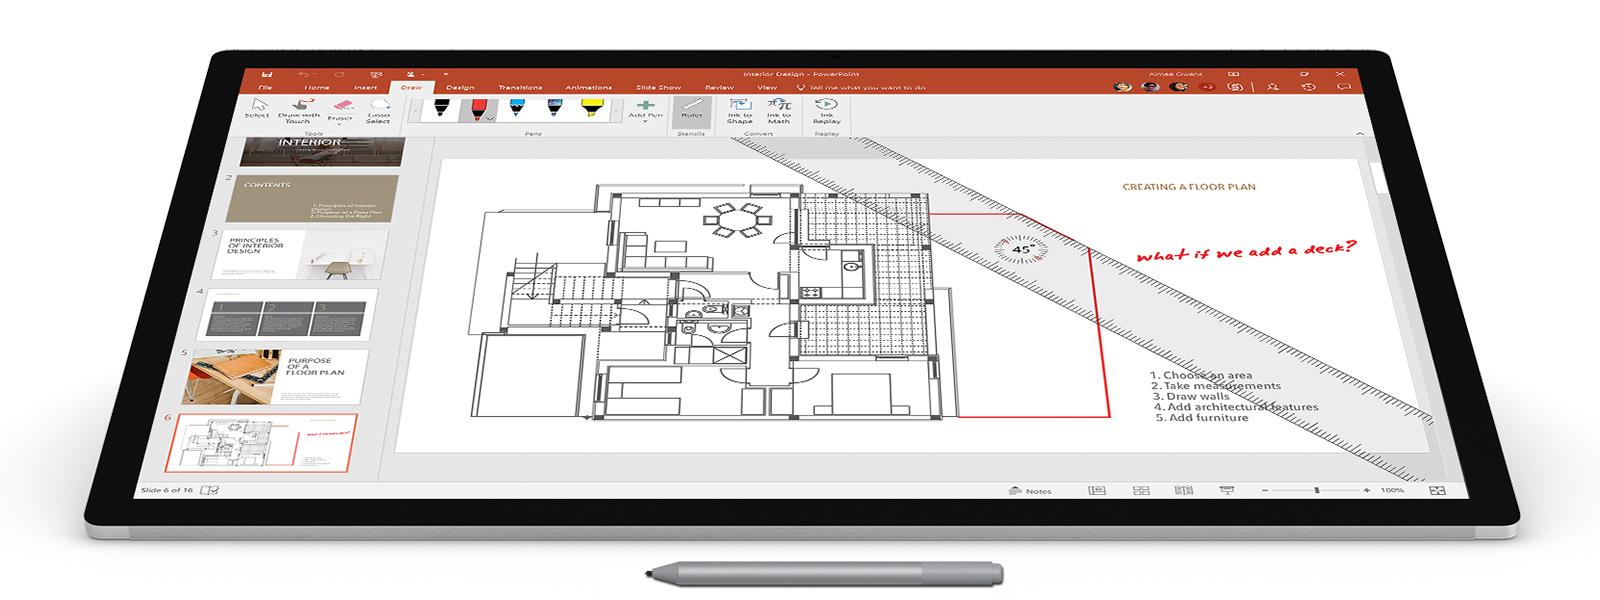 Surface ペン、書き込み、オンスクリーン ルーラーが見えるフロアプランのスクリーンショット